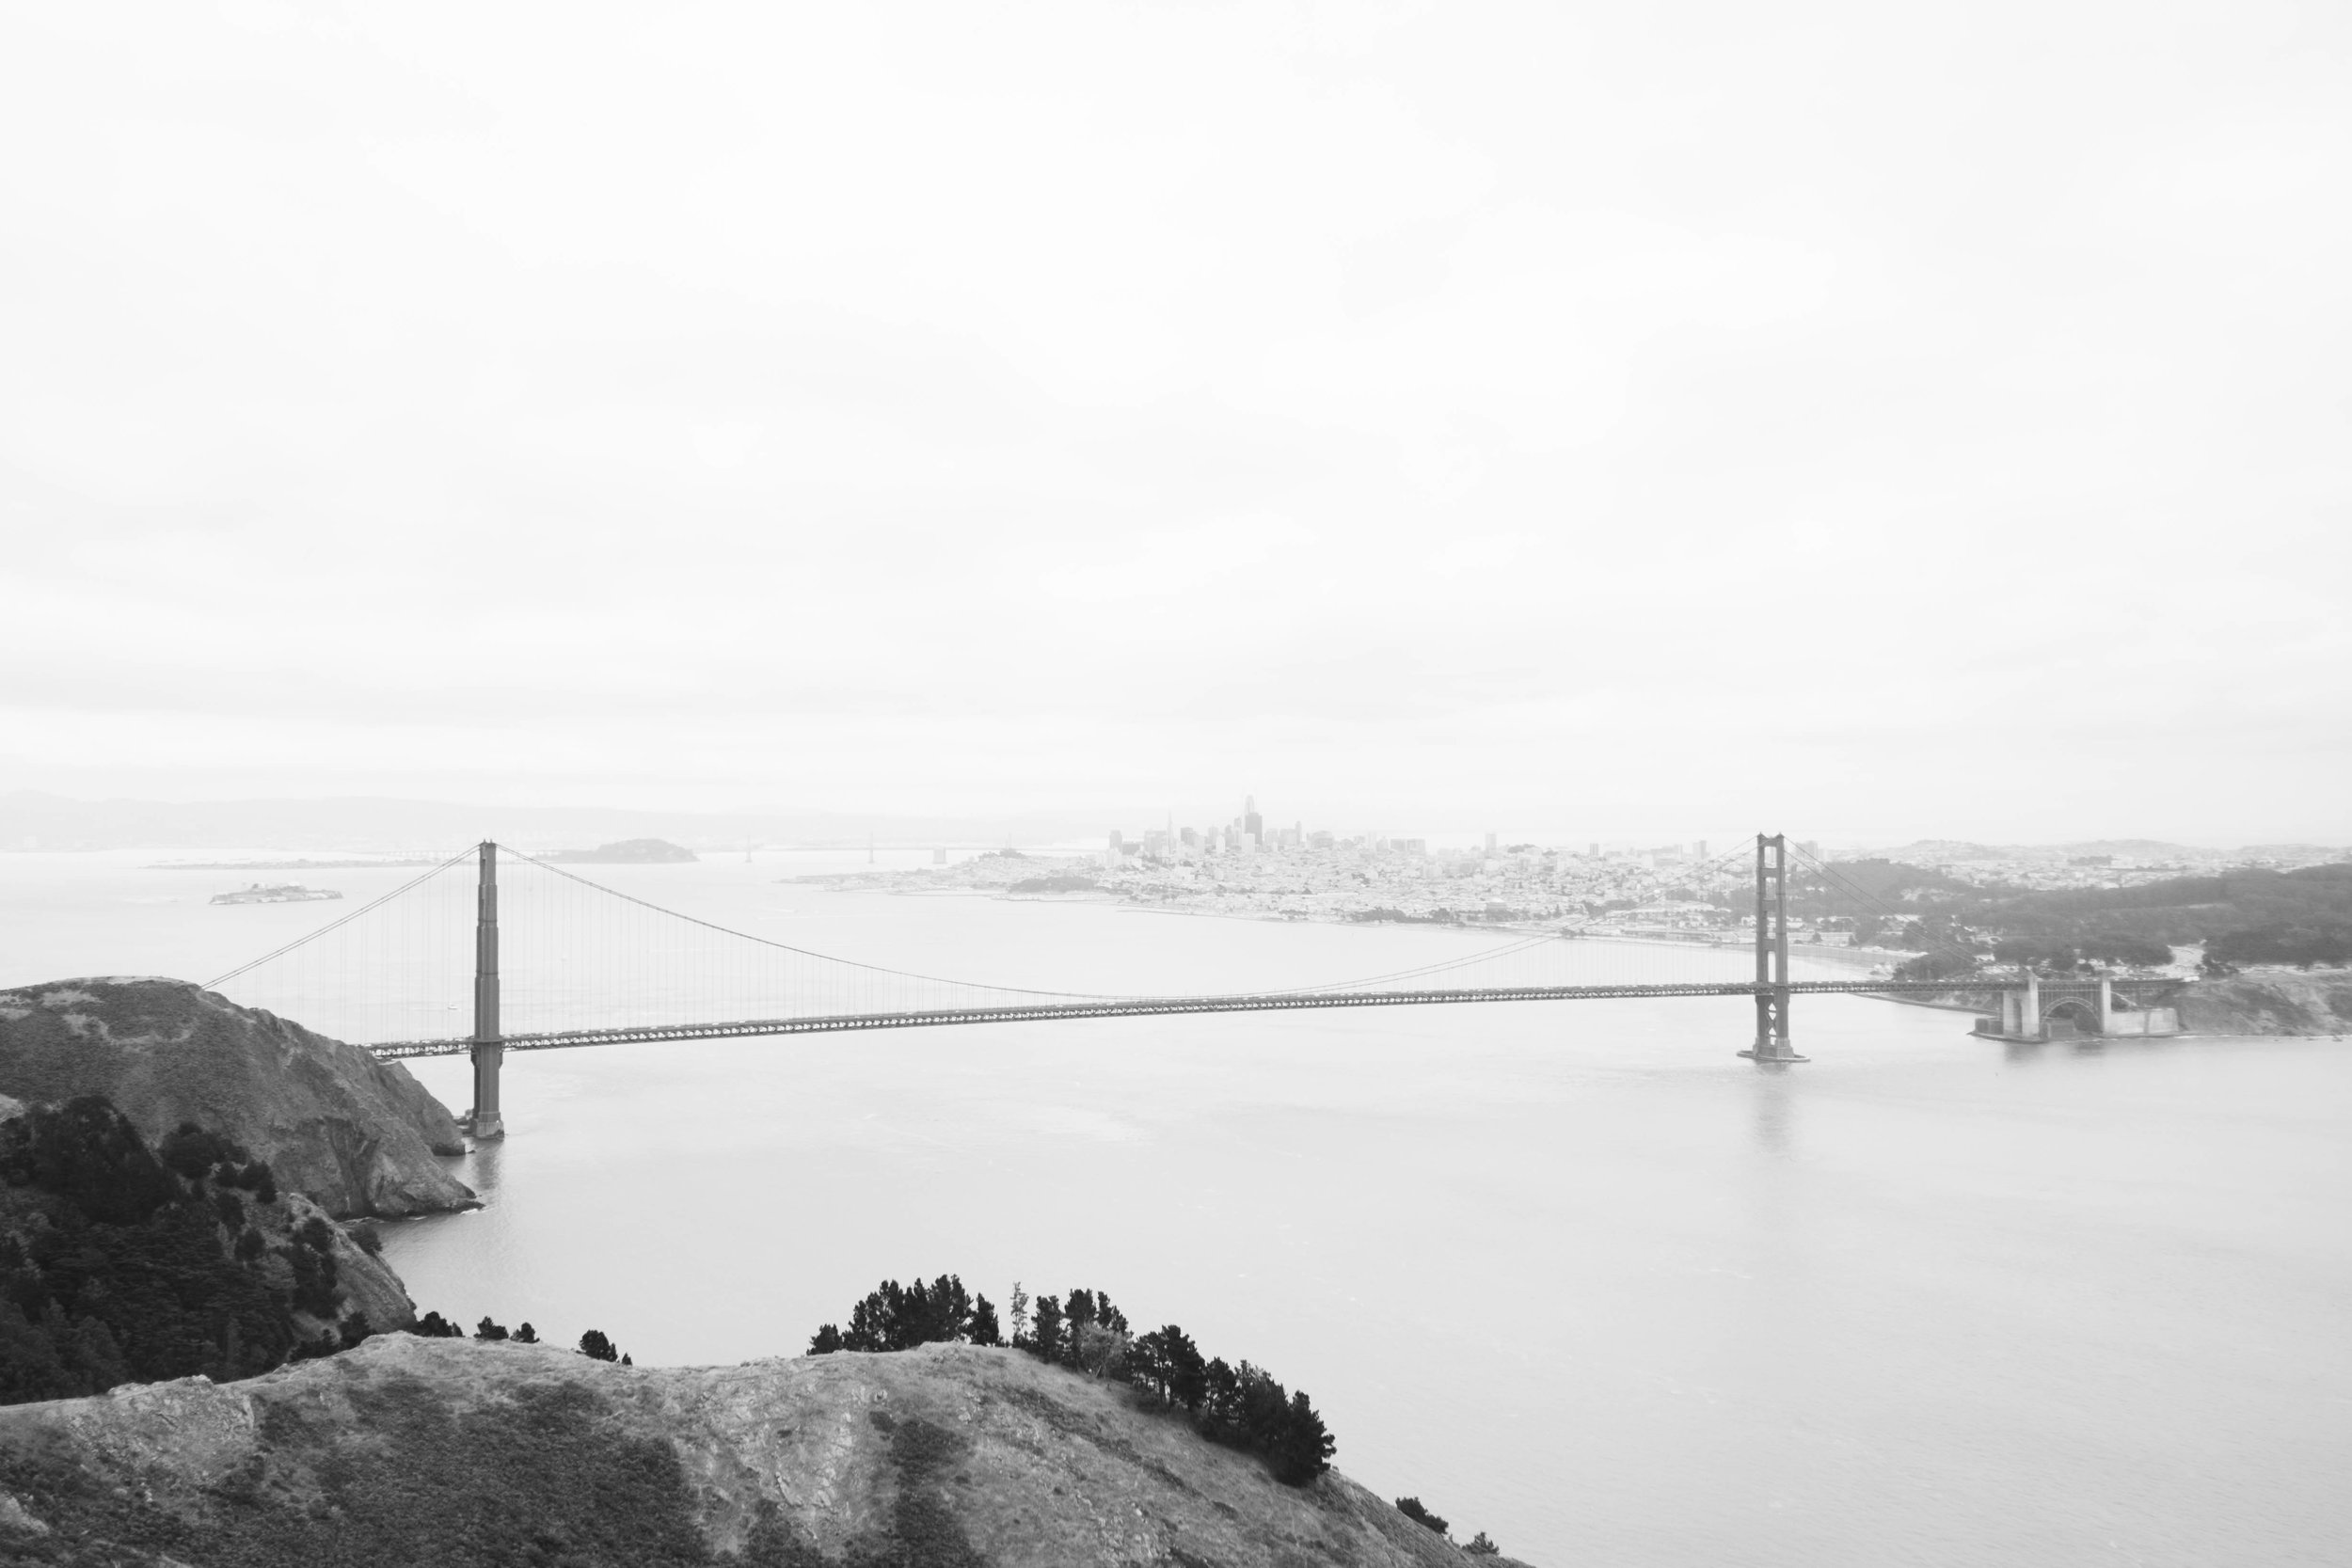 San_Francisco15.jpg